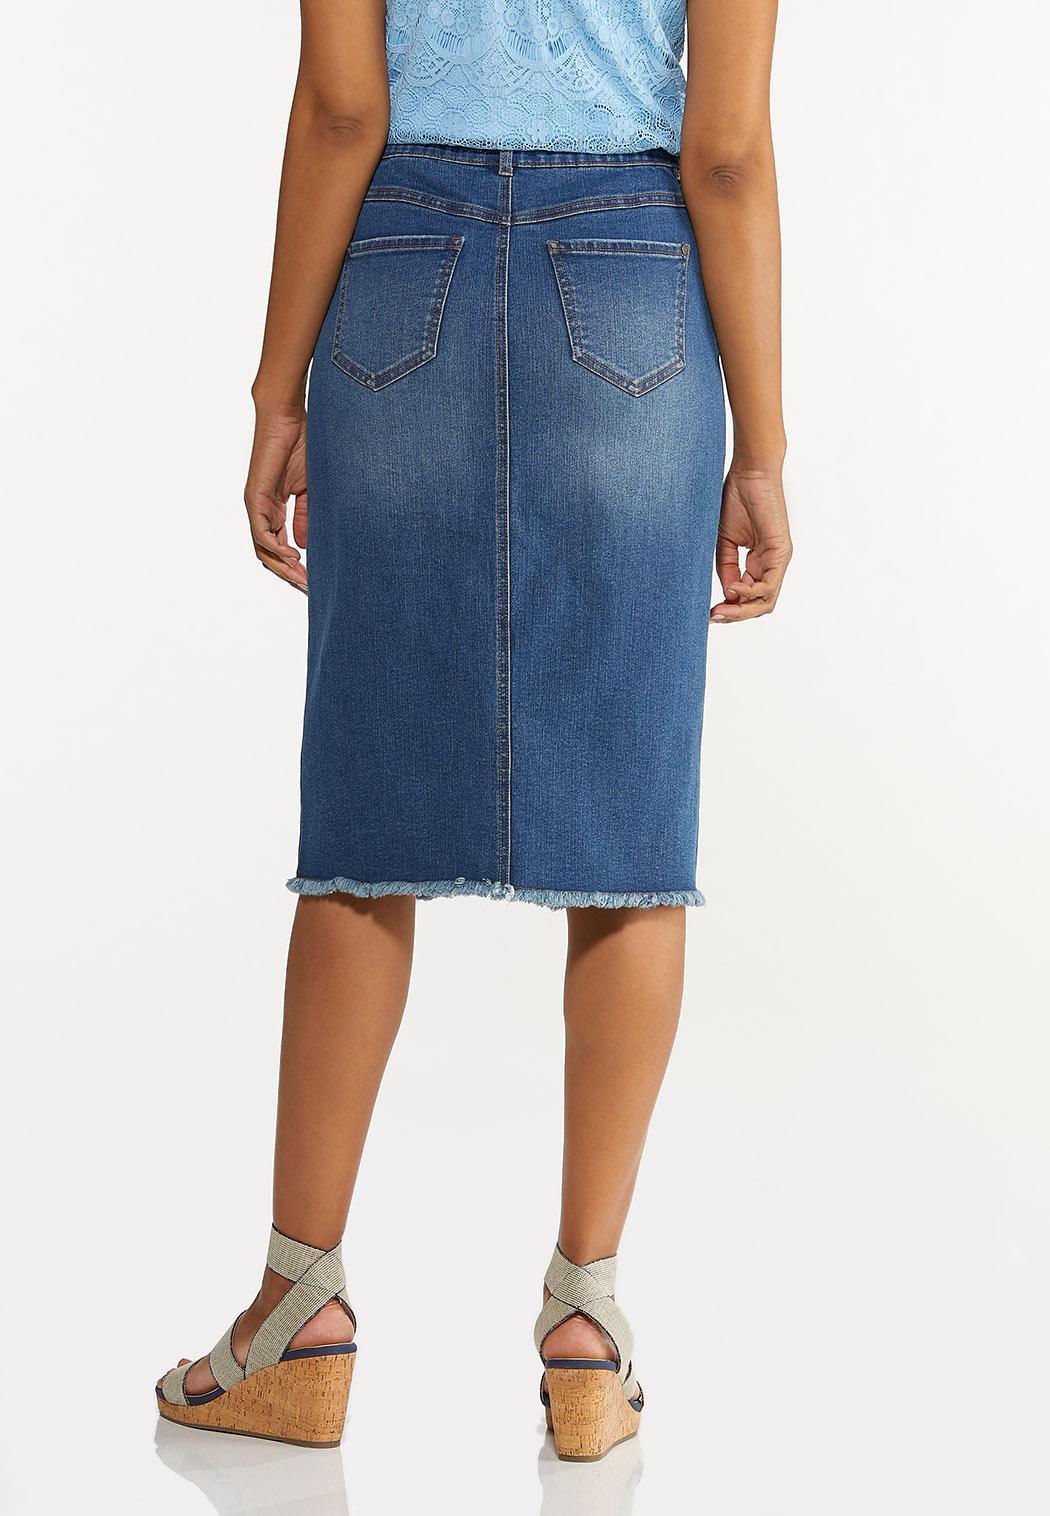 Frayed Denim Pencil Skirt (Item #44594754)